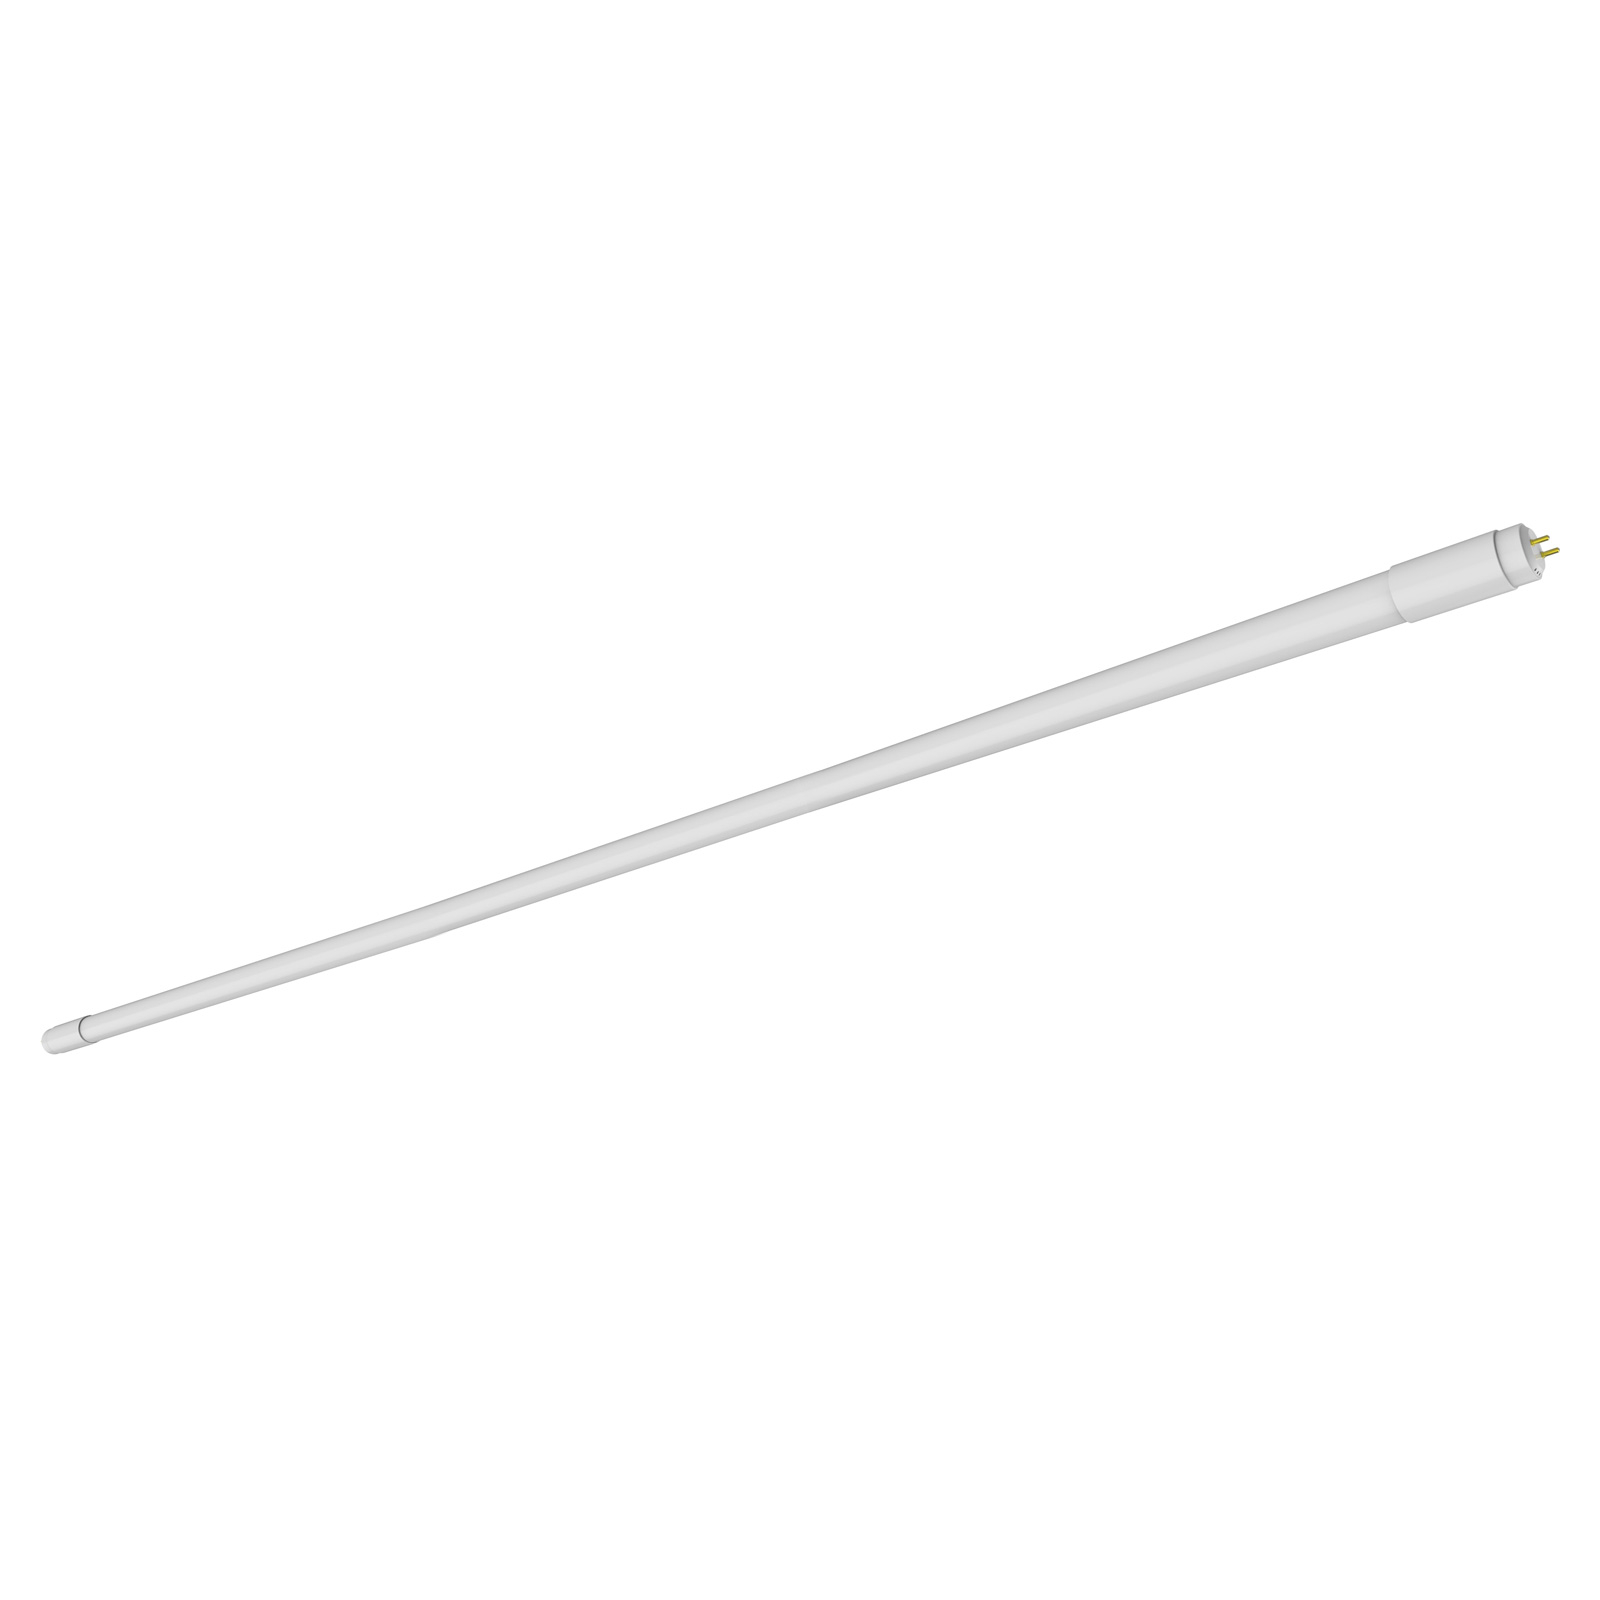 LED Tube ToLEDo Superia G13 150 cm 24W 6500 K